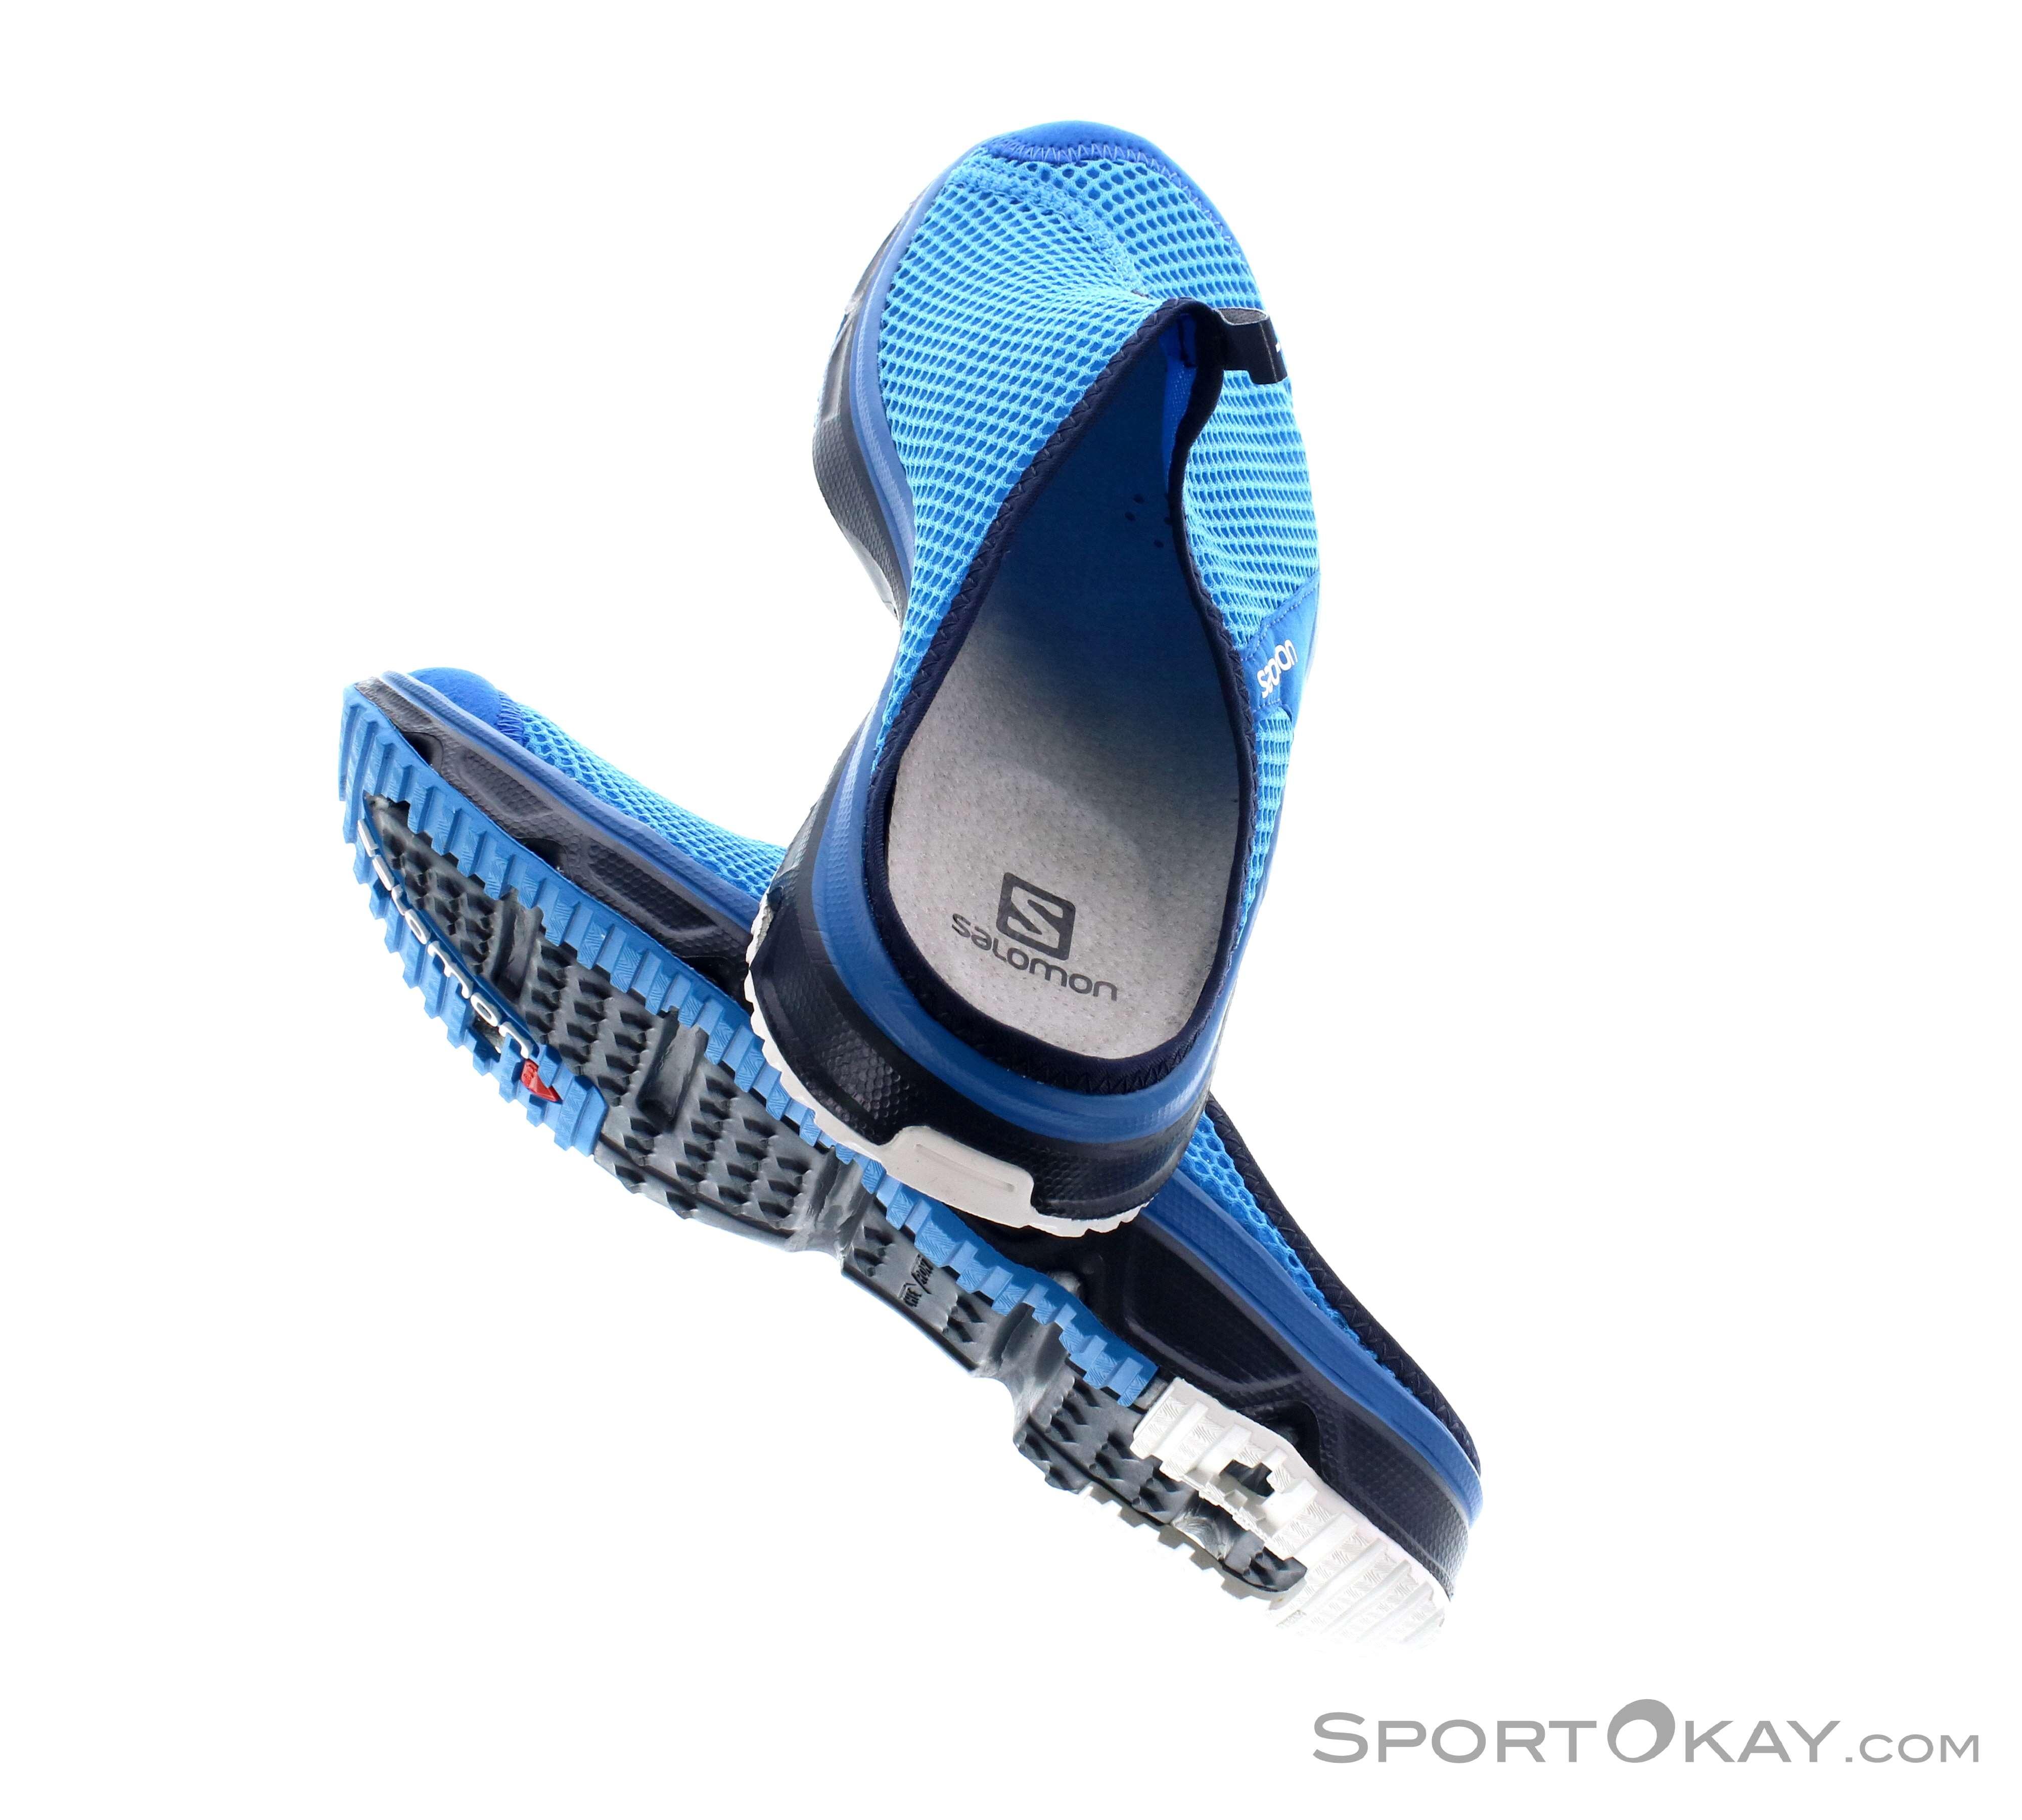 salomon rx slide 3 0 mens leisure sandals leisure shoes. Black Bedroom Furniture Sets. Home Design Ideas